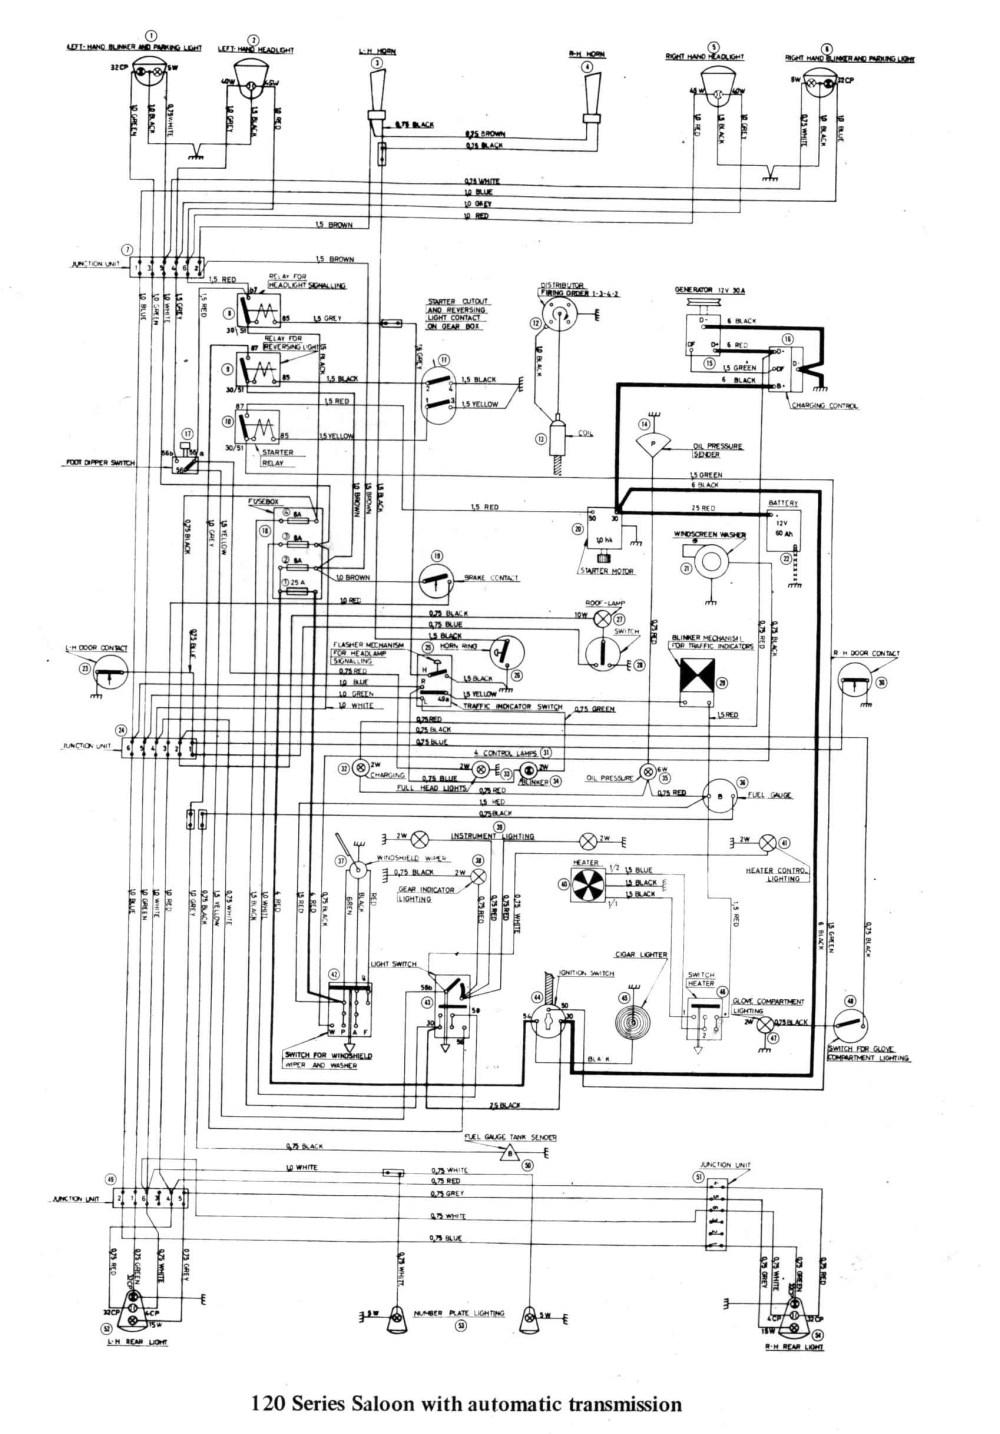 medium resolution of john deere 850 wiring schematic